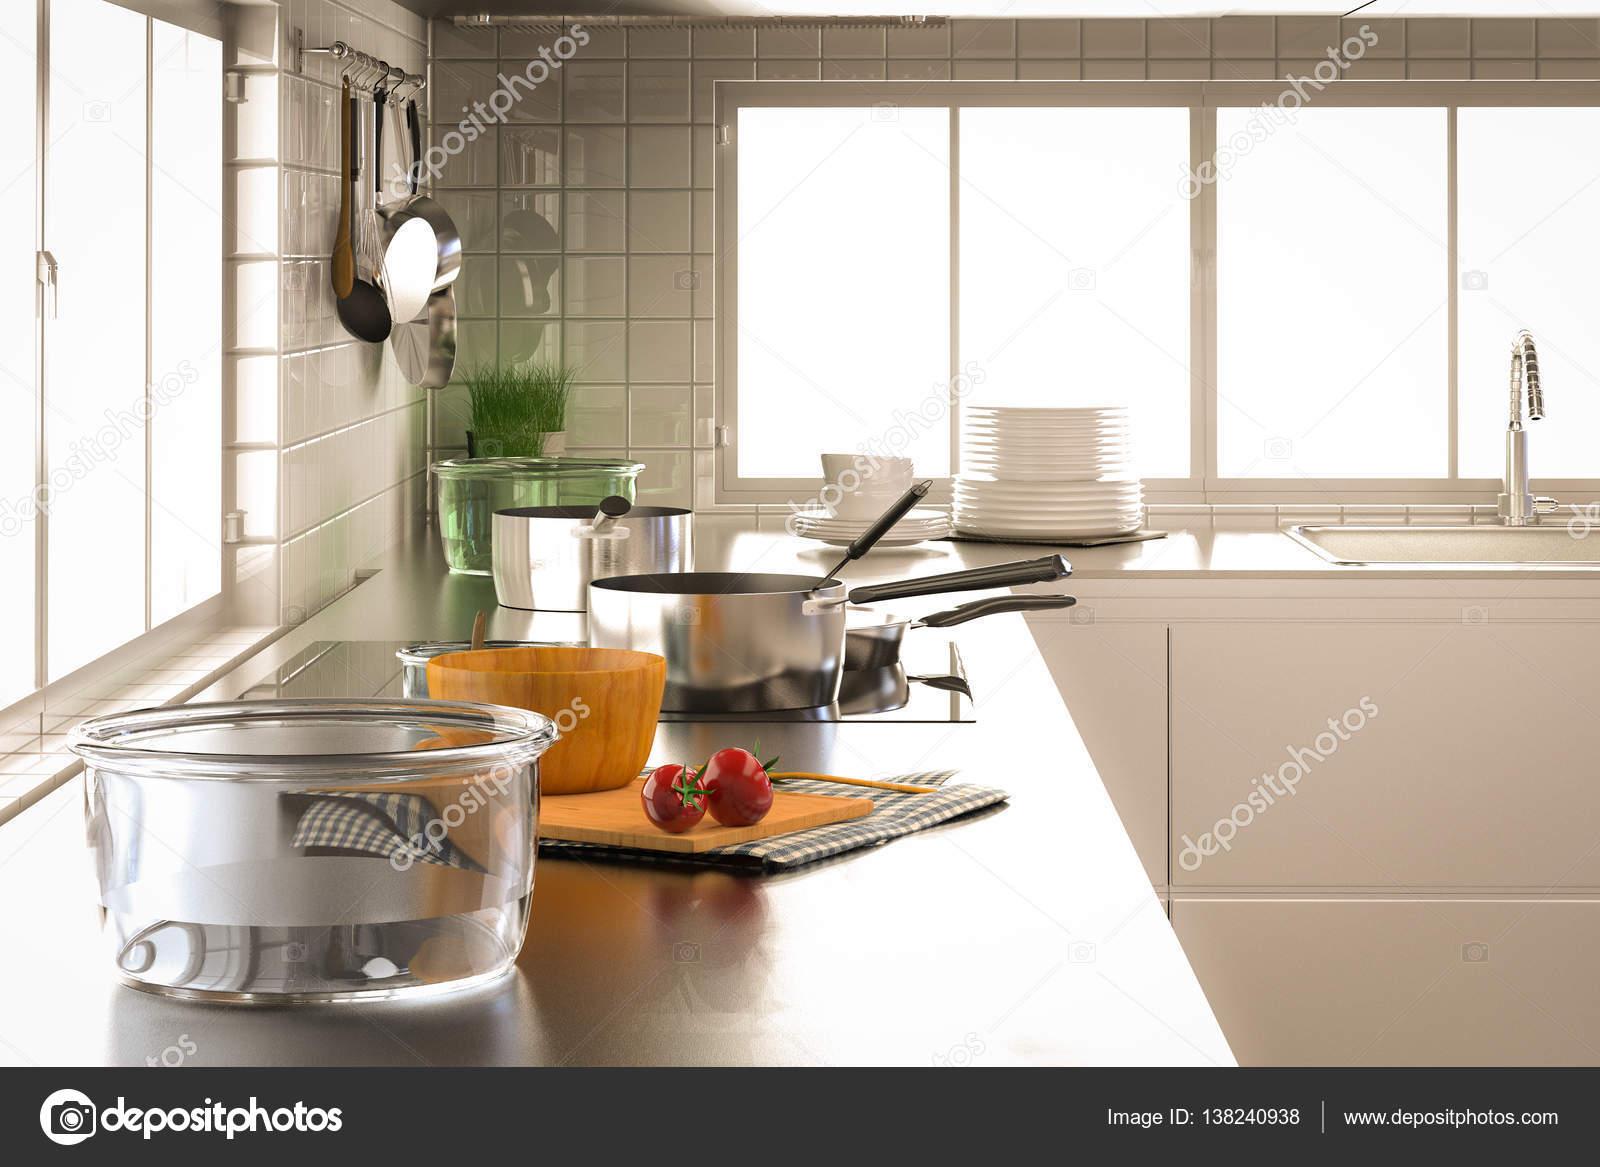 Glasschale mit Küchenutensilien — Stockfoto © phonlamai #138240938